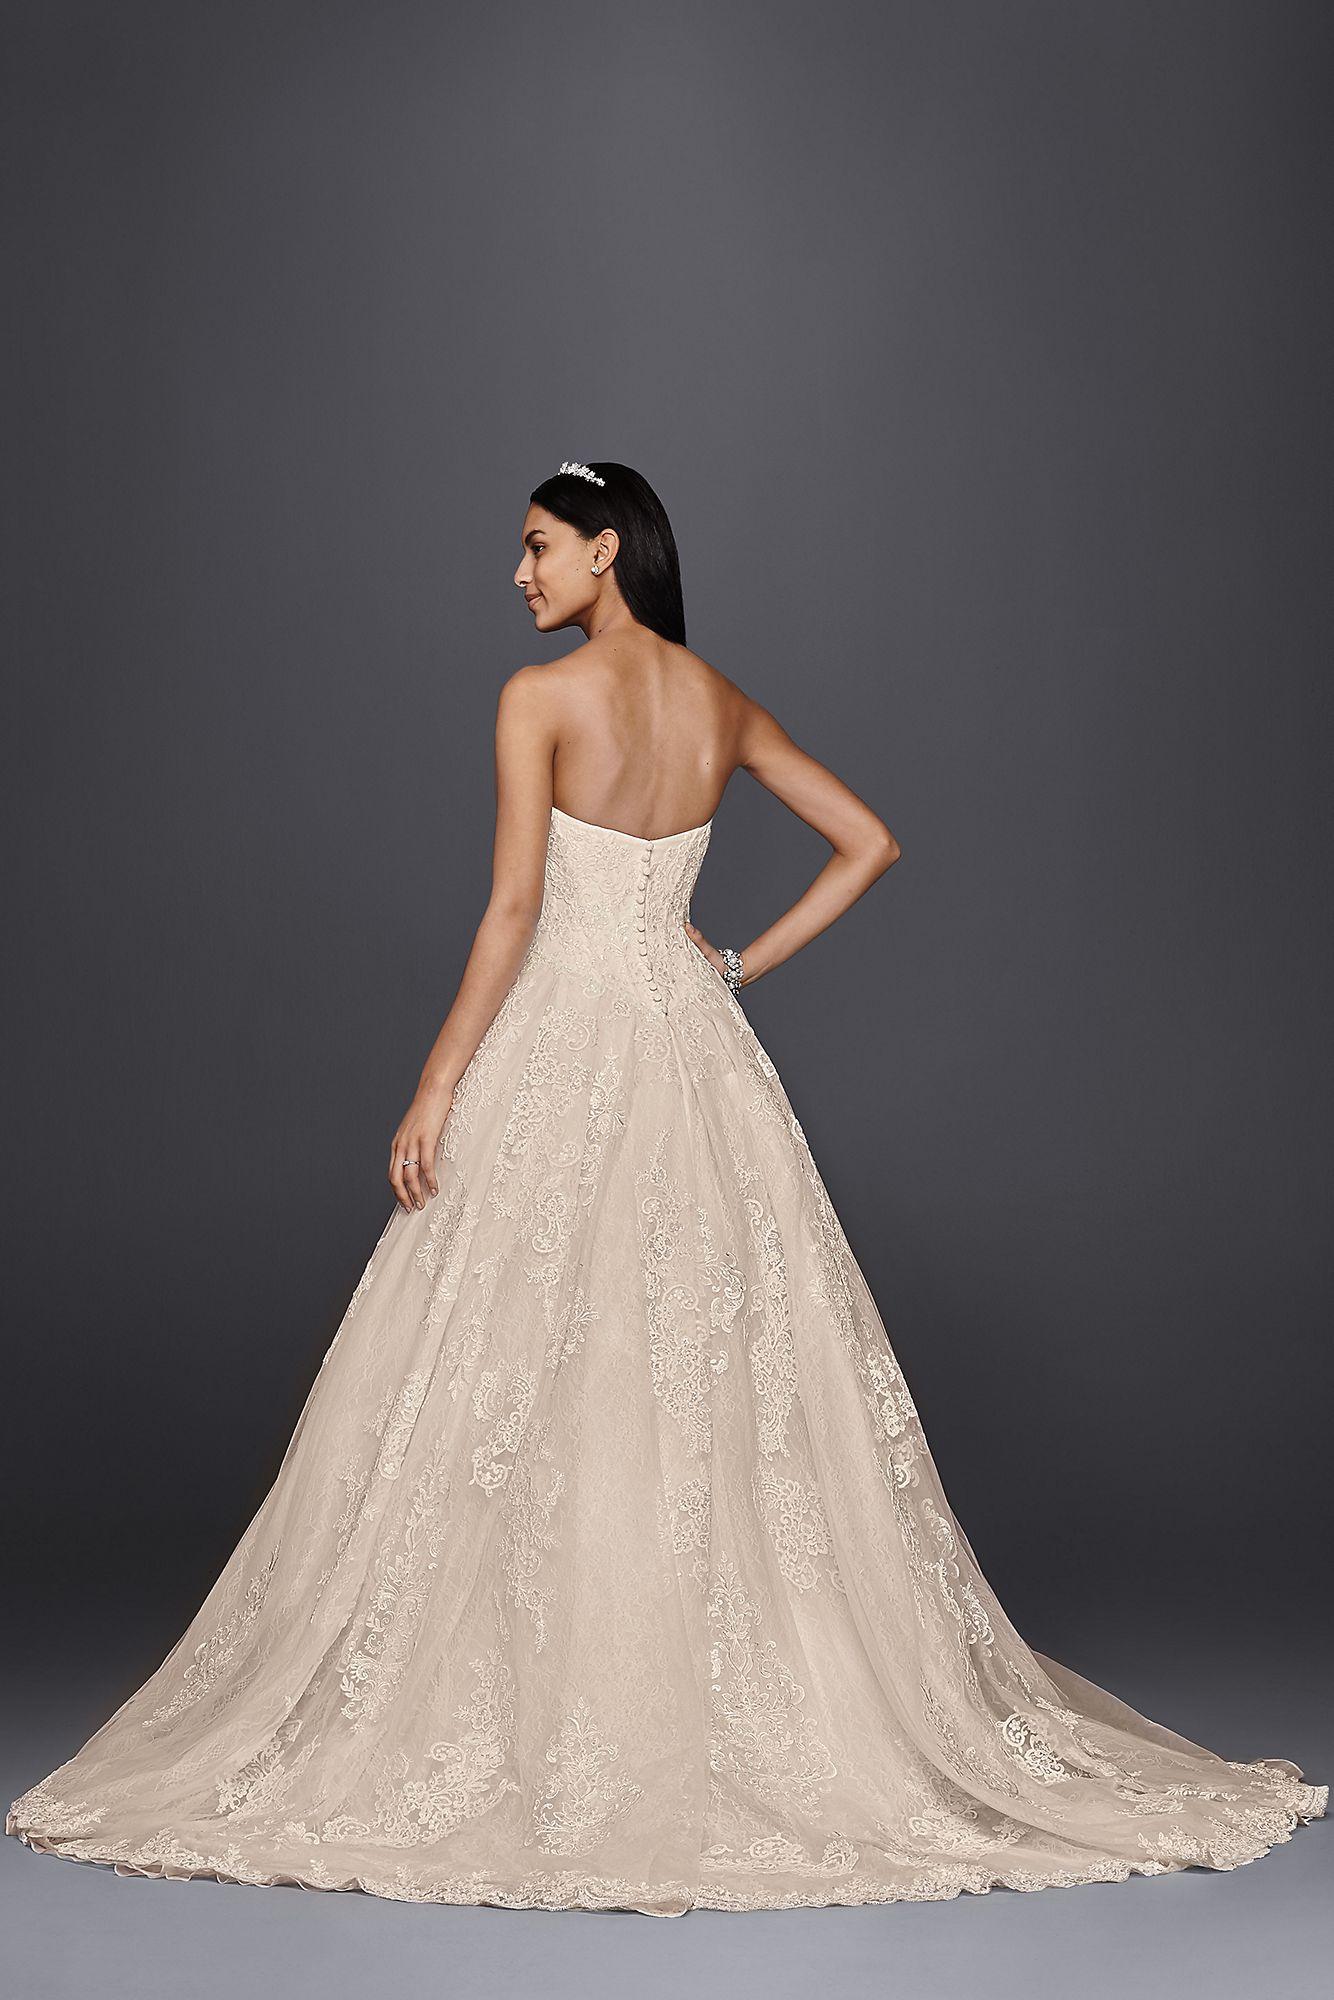 sweetheart neckline wedding dresses photo - 1